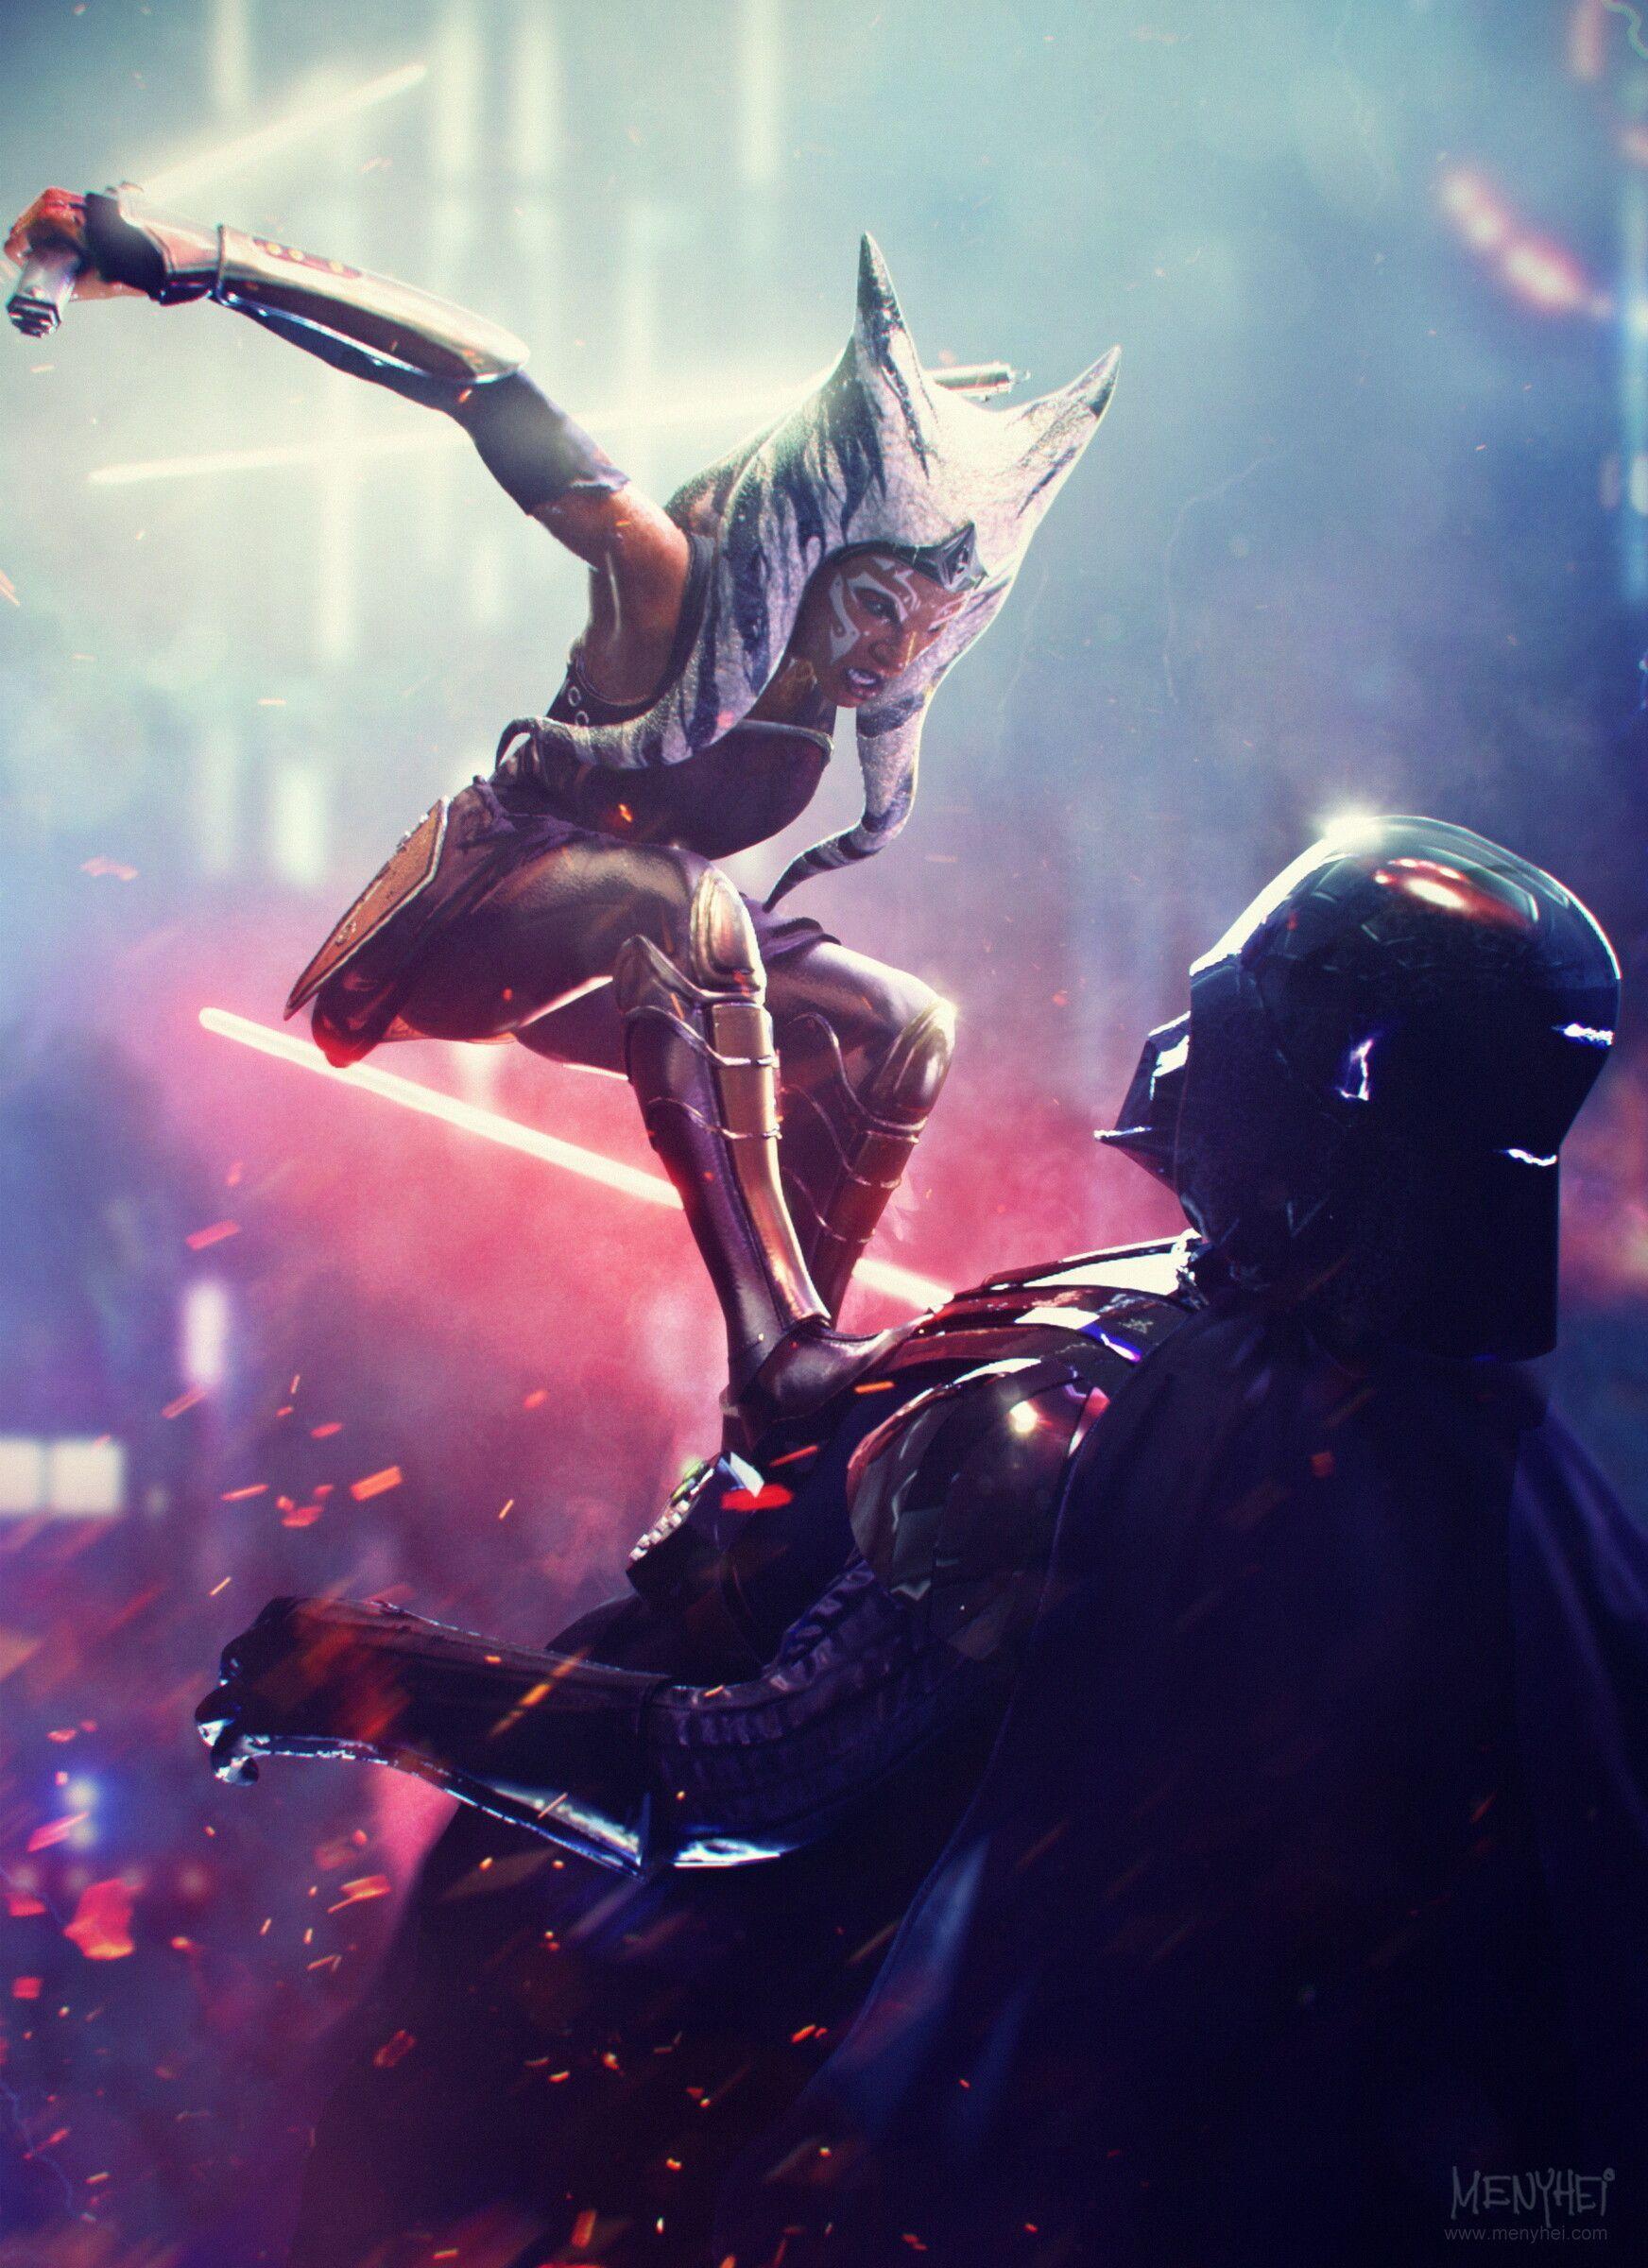 ArtStation - I am no jedi - Ahsoka Tano vs Vader, Saby Menyhei #odyssÉe ArtStation - I am no jedi - Ahsoka Tano vs Vader, Saby Menyhei #odyssÉe